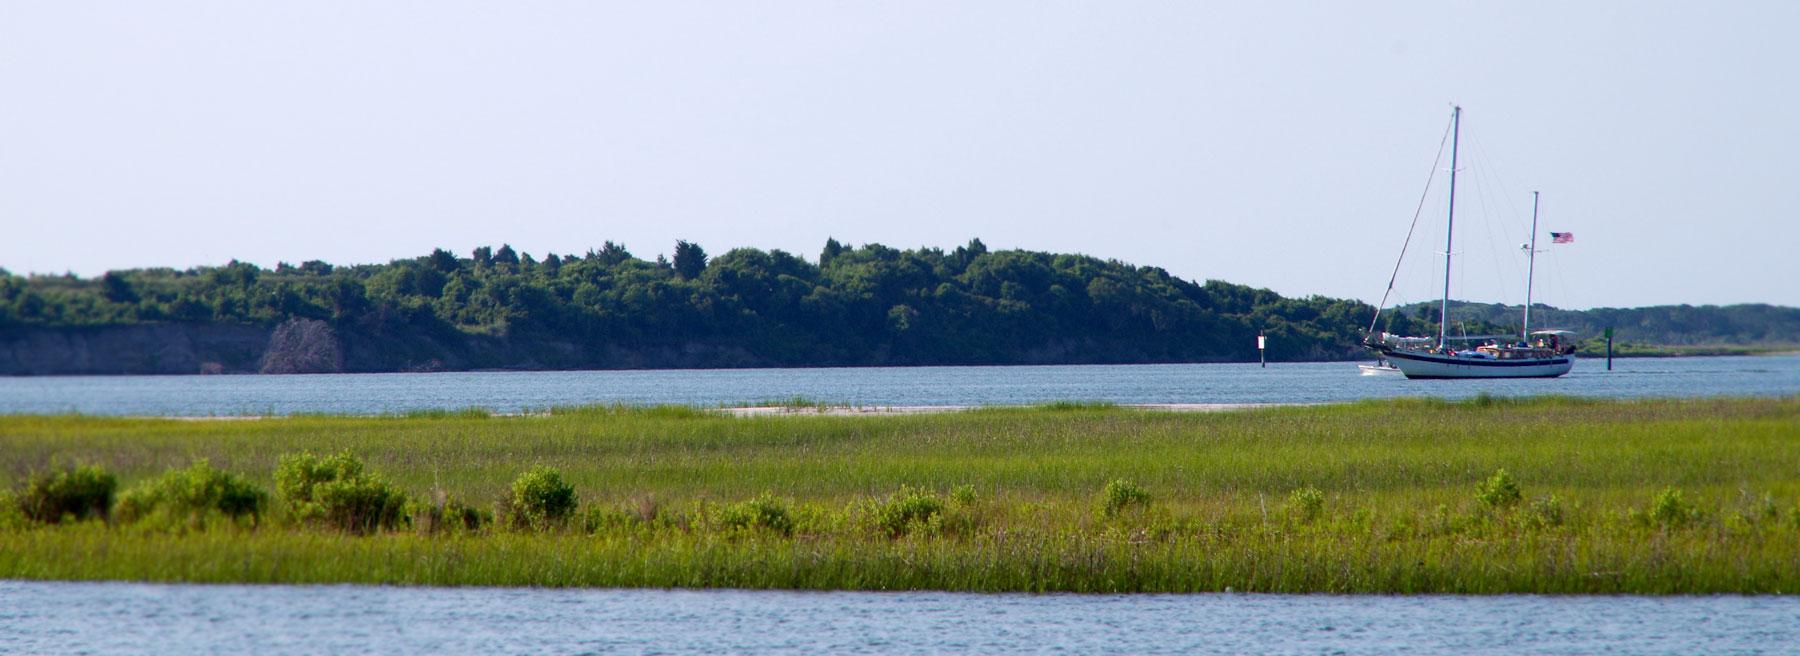 Sailboat in Morehead City North Carolina, Gull Isle Real Estate